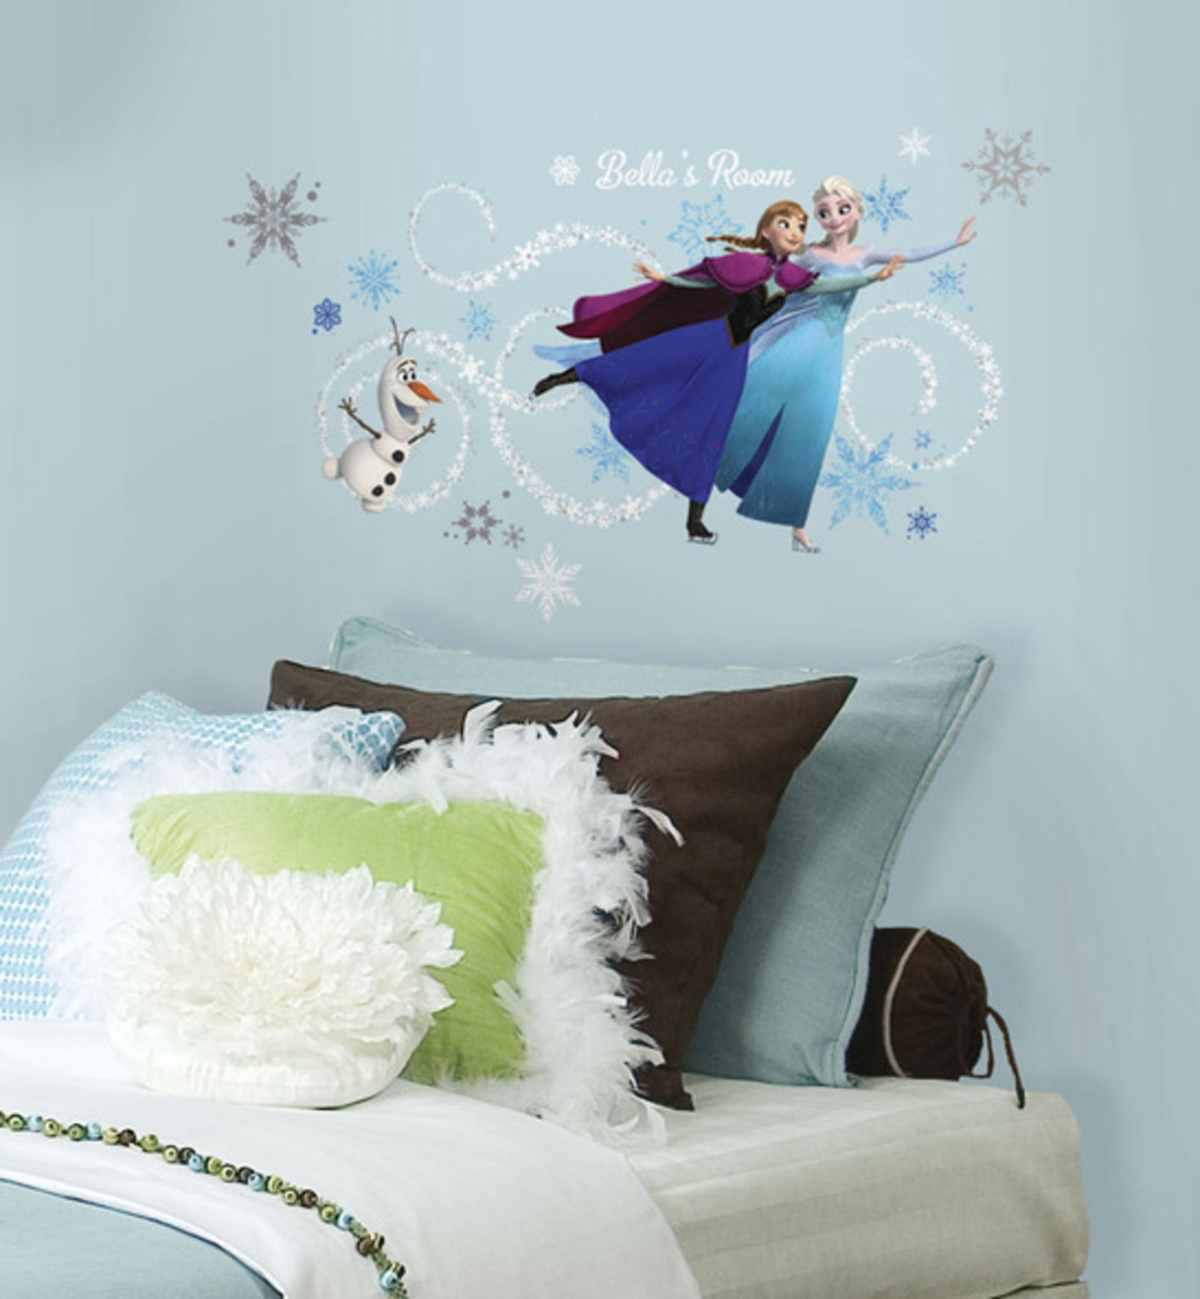 Roommates wallstickers frozen alfabetet inspirasjon til nytt hus roommates wallstickers frozen alfabetet amipublicfo Choice Image